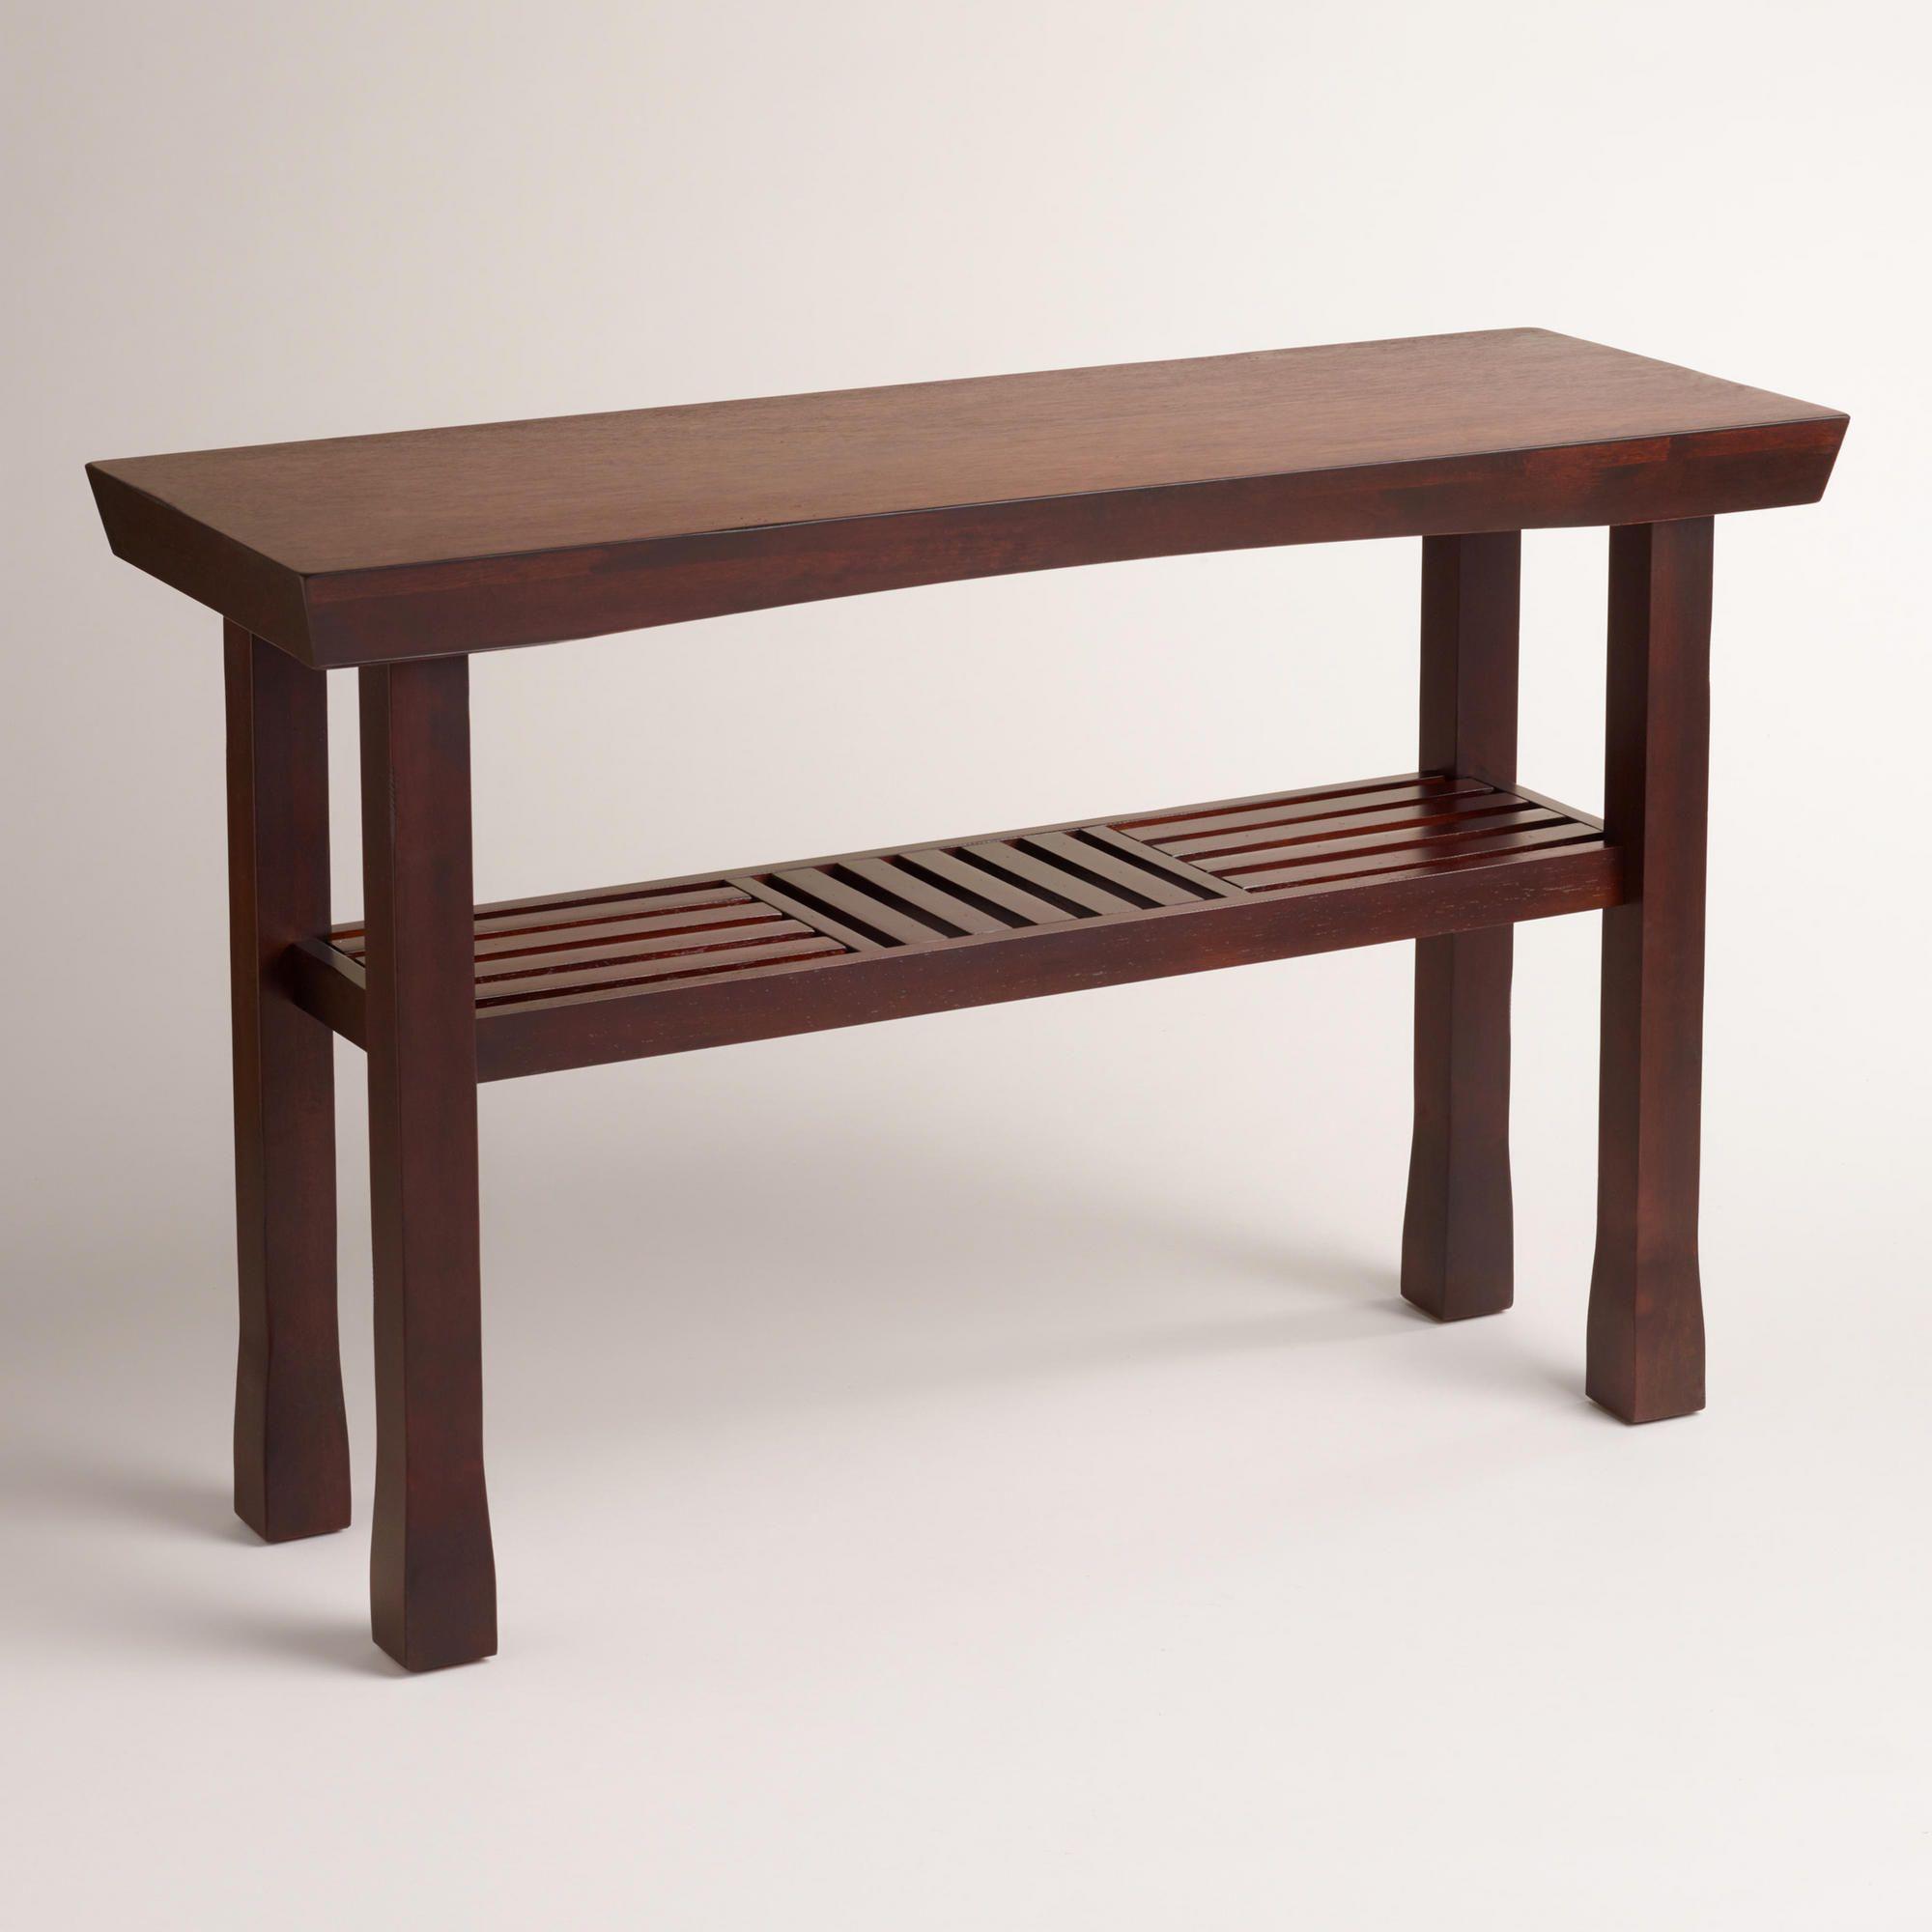 Hako Console Table Outdoor Console Table Sofa Table Furniture